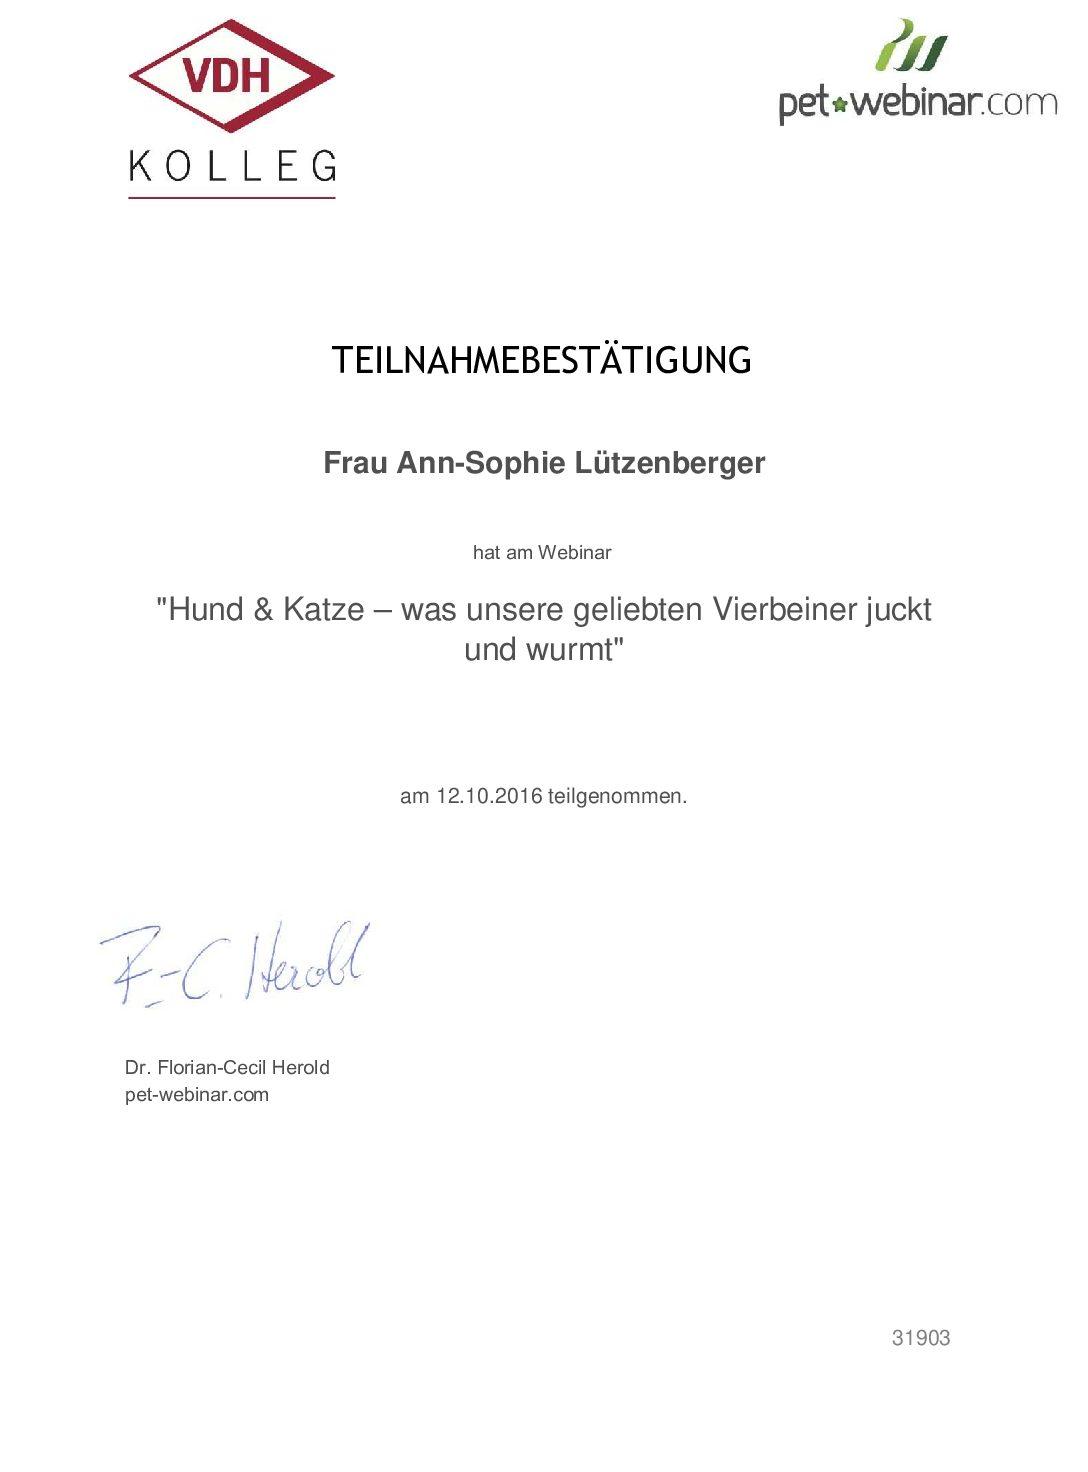 VDH Kolleg 3